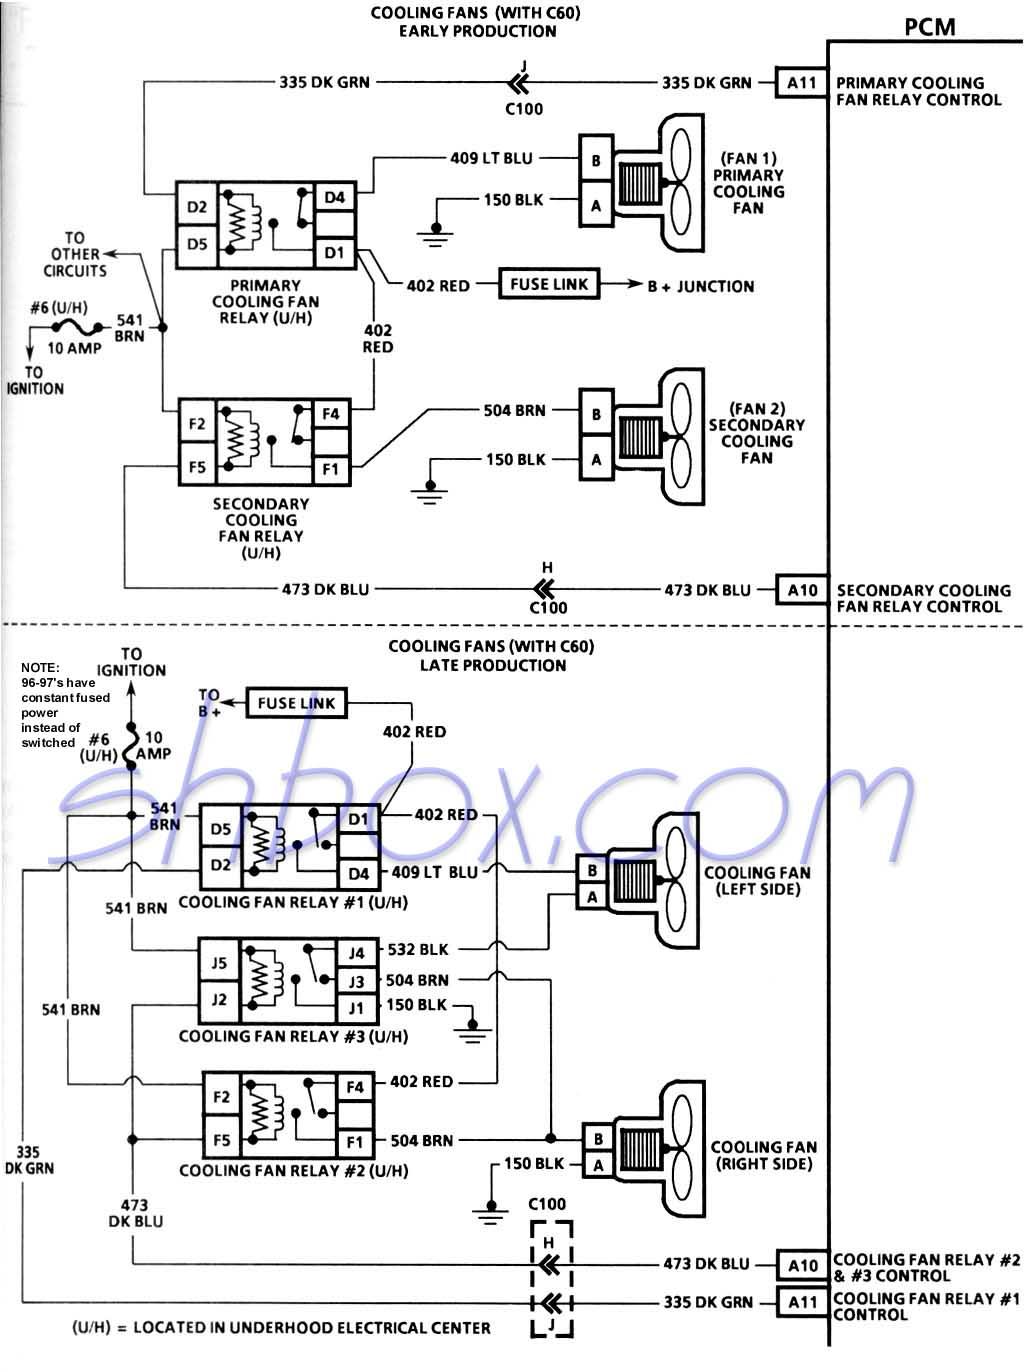 99 Cabrio Fuel Pump Relay Location on 1996 Lt1 Wiring Harness Diagram